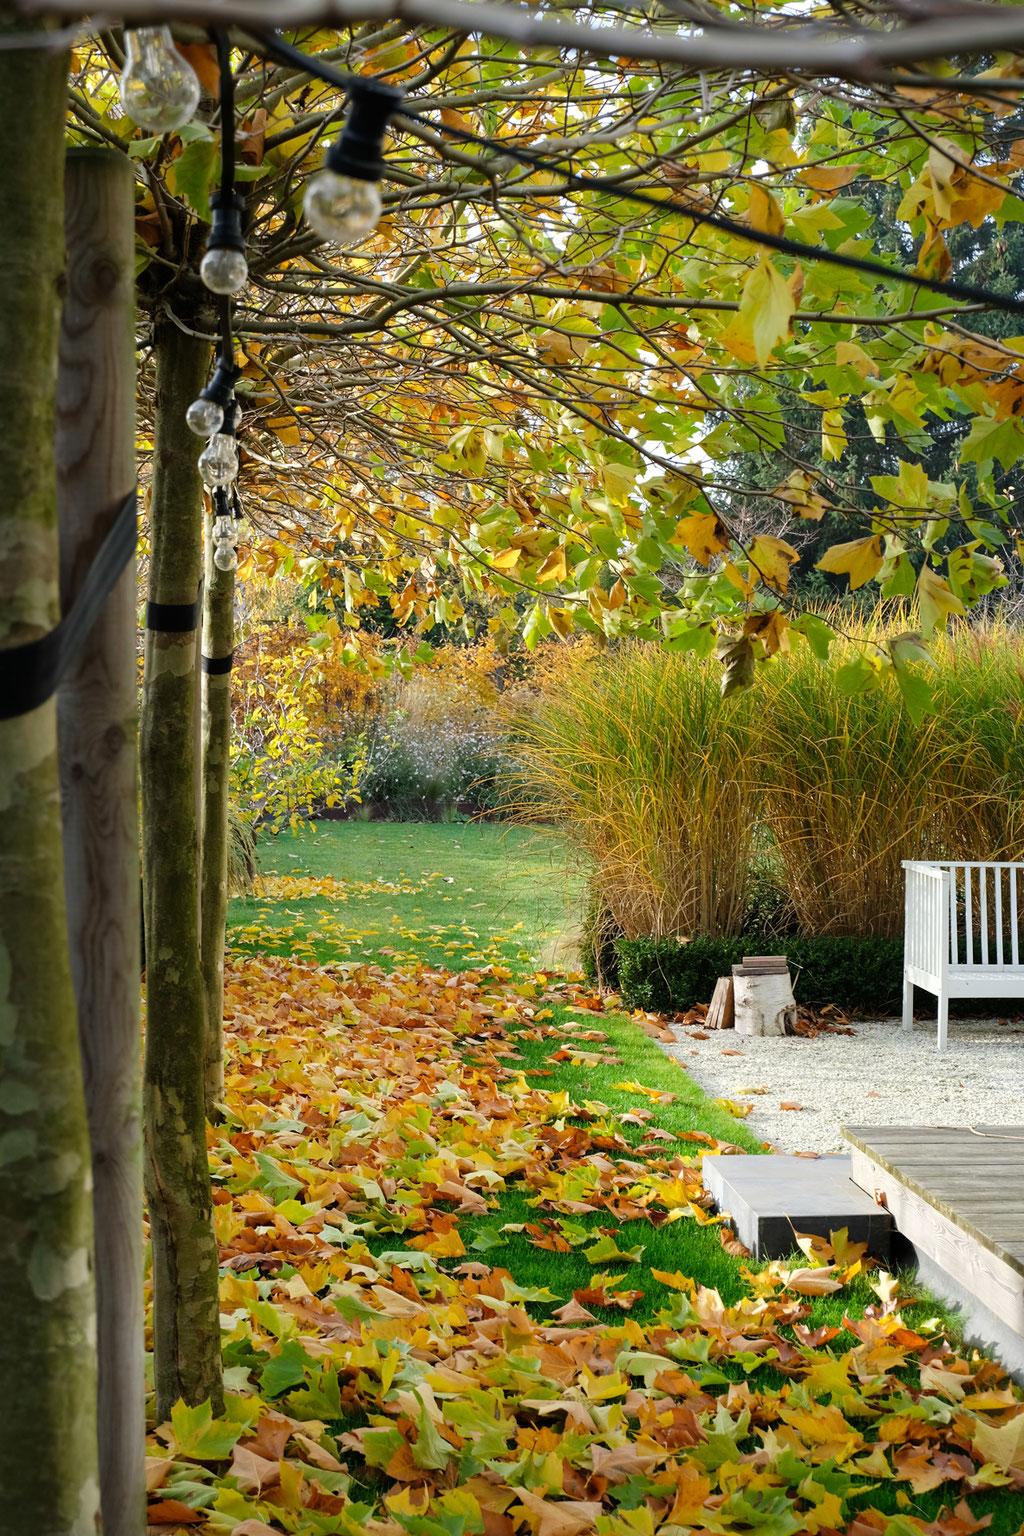 dieartigeGARTEN - Novembergarten | Platanen-Laub, Herbstlaub, goldener Herbst, Blattgold+Terrasse, Gräser